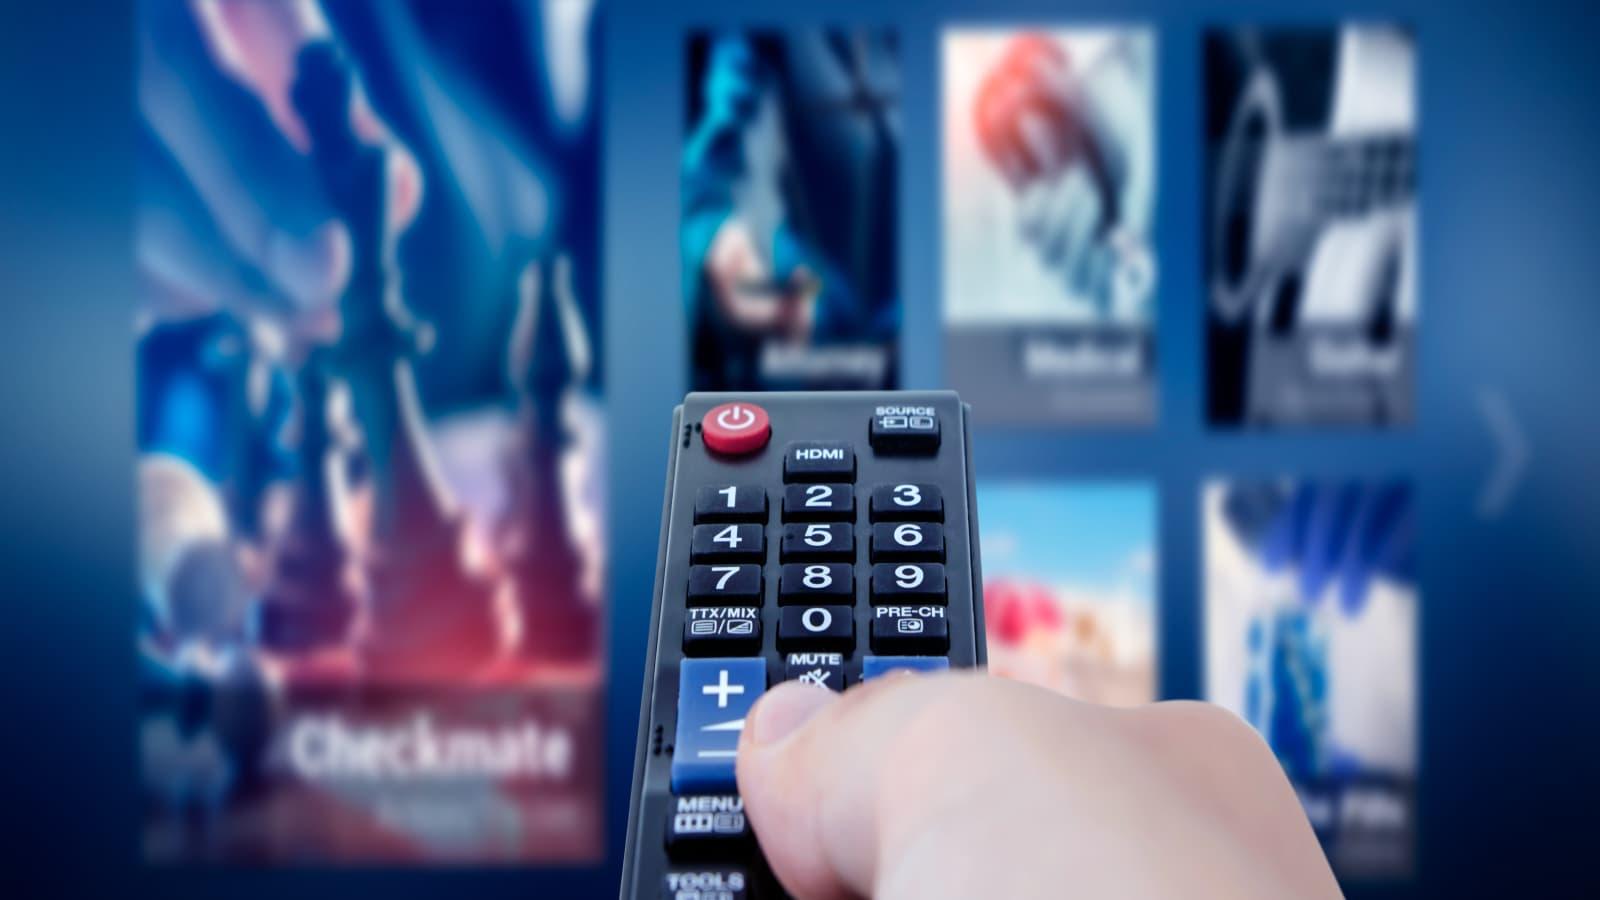 Tremblez devant la saga Resident Evil en VOD chez SFR